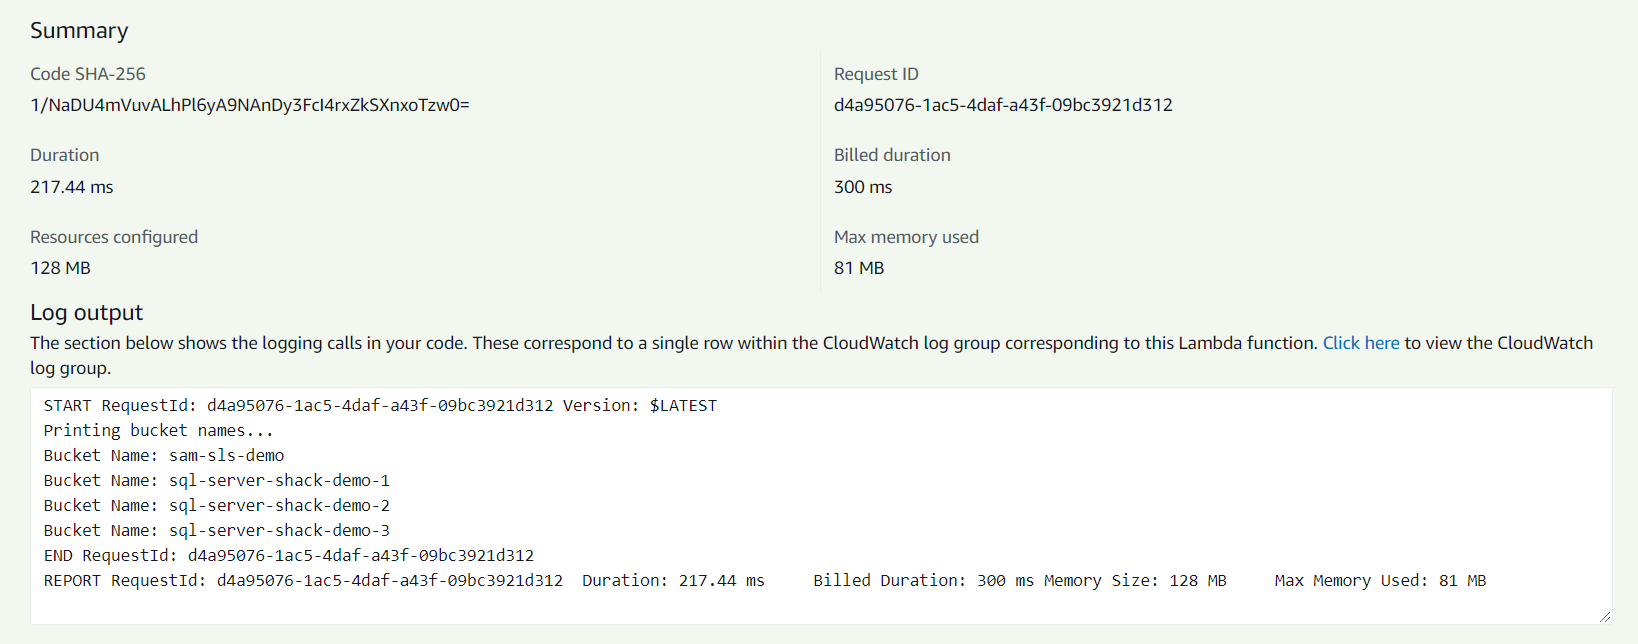 Executing the AWS Lambda Function